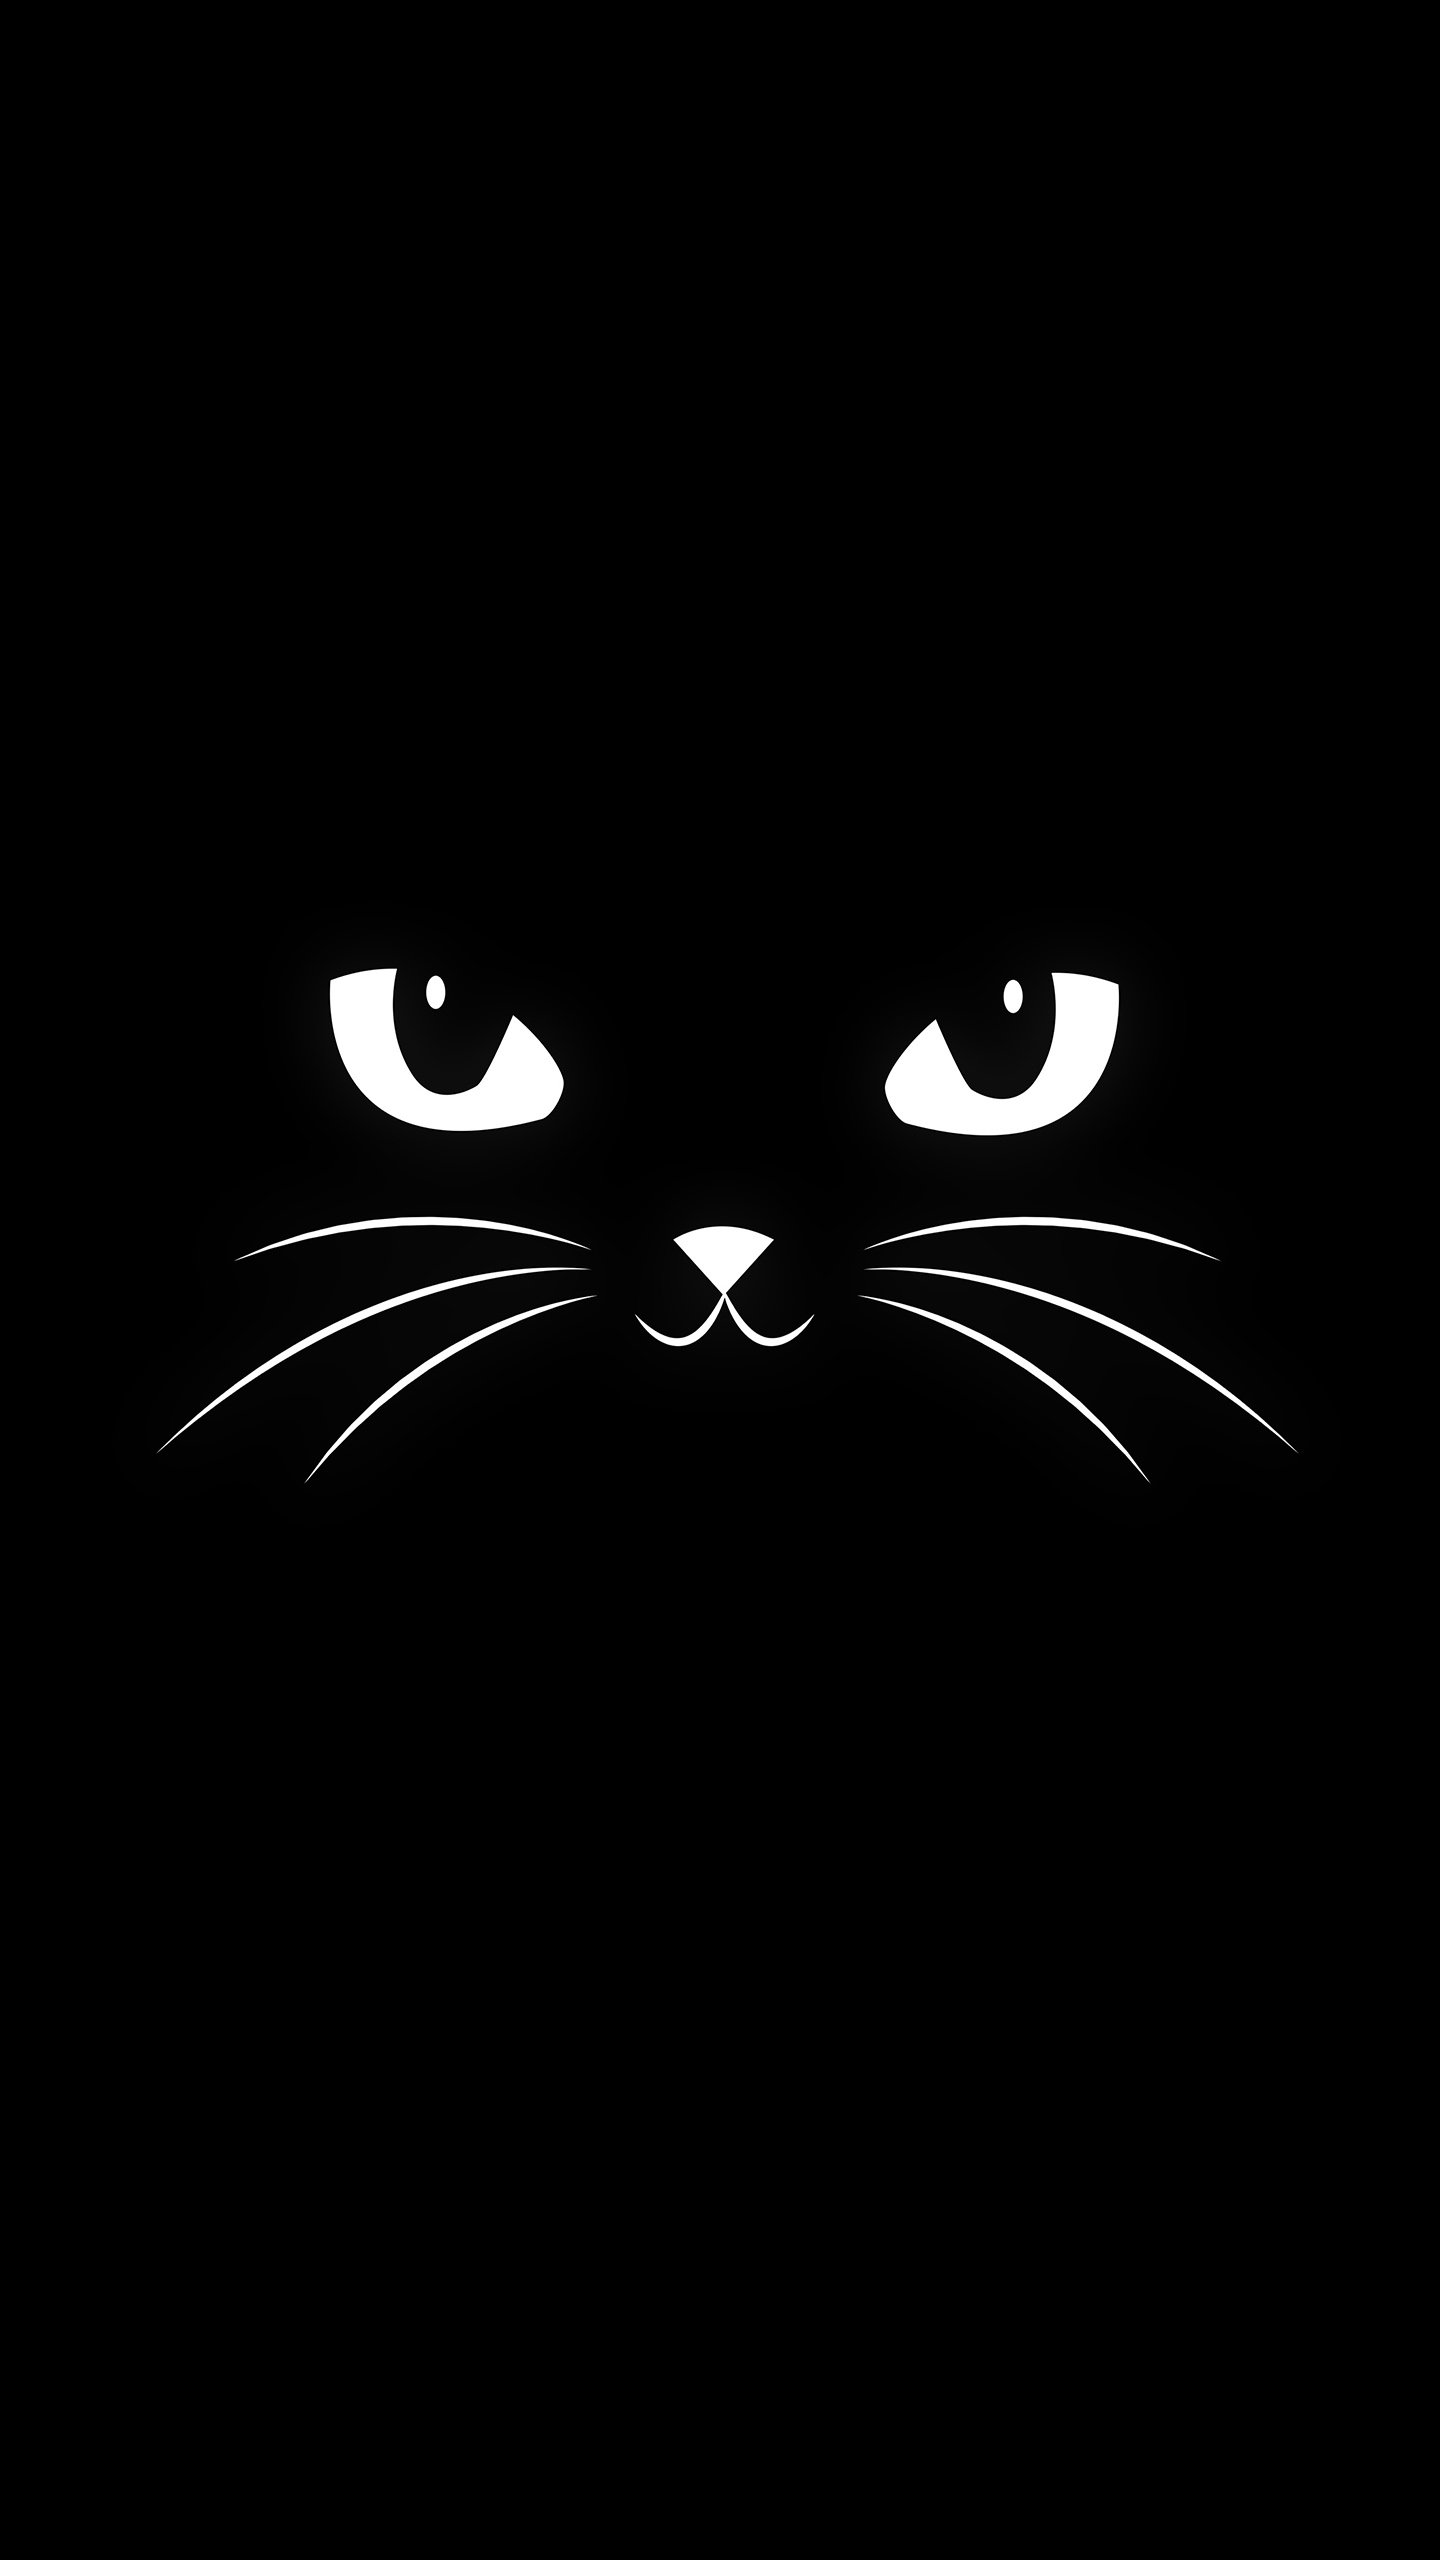 Black Cat iPhone Wallpaper iPhone Wallpaper